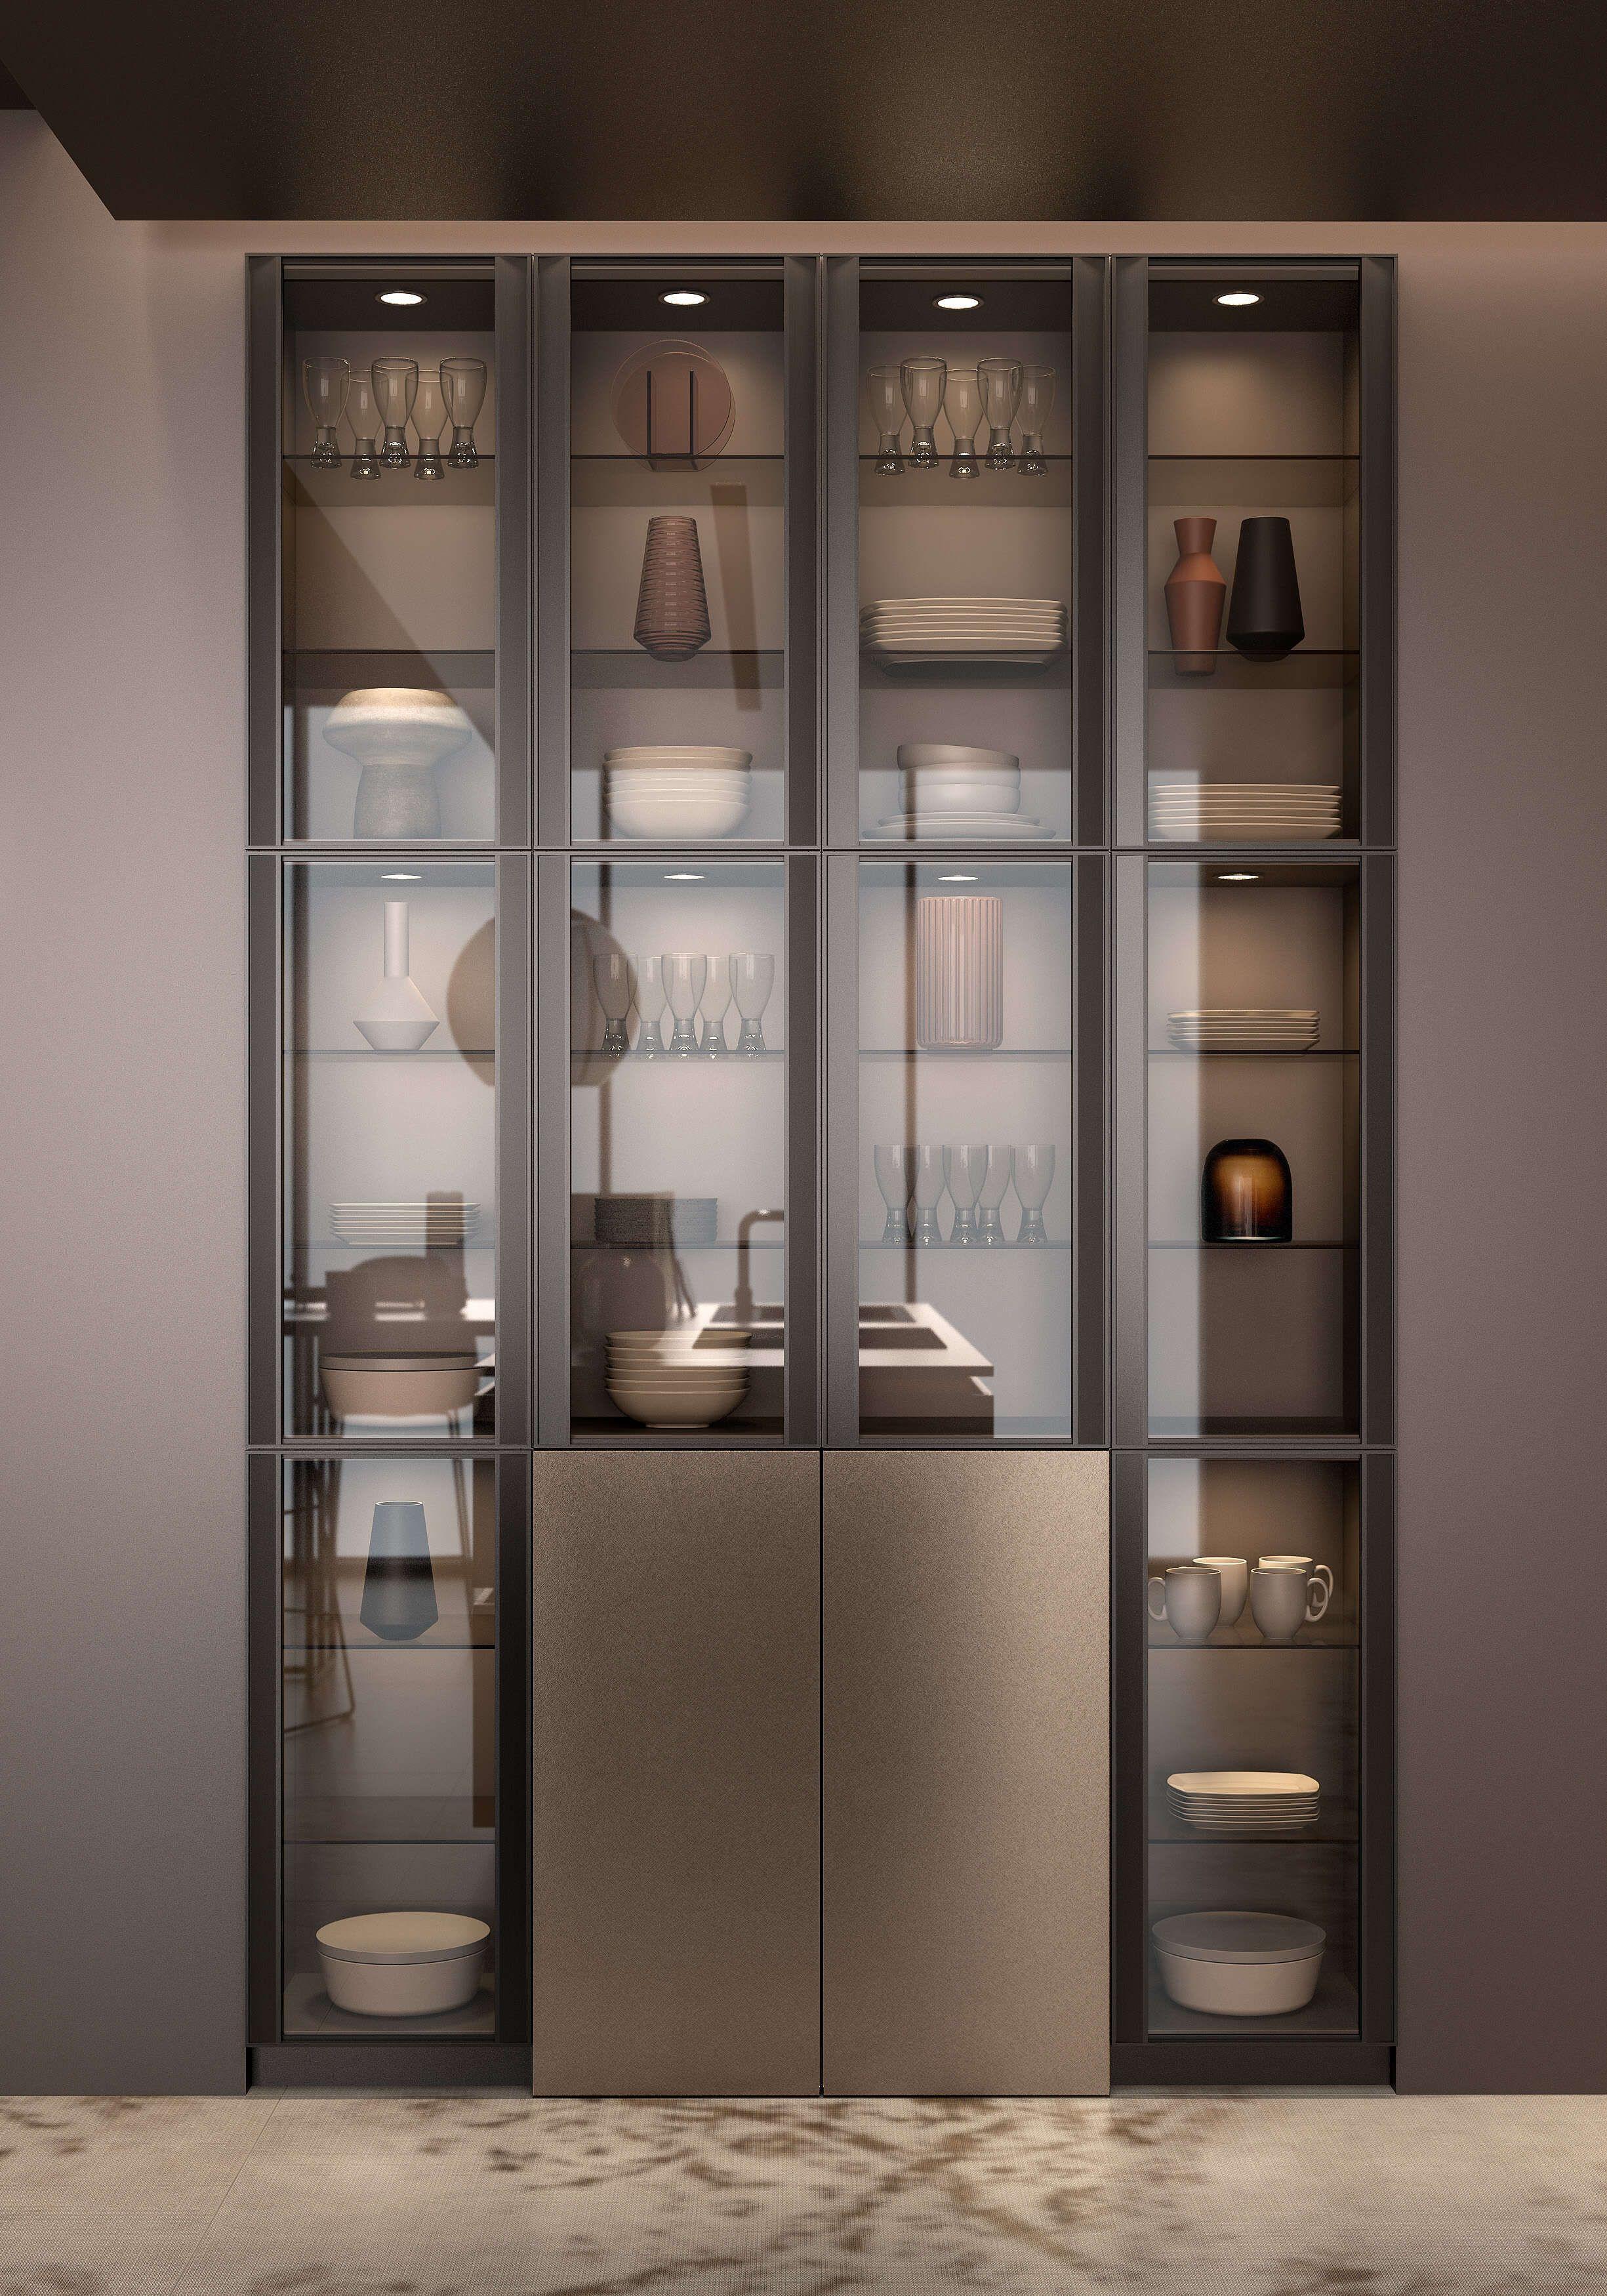 Accueil Cuisine Moderne Design De Cuisine Moderne Cuisines Design